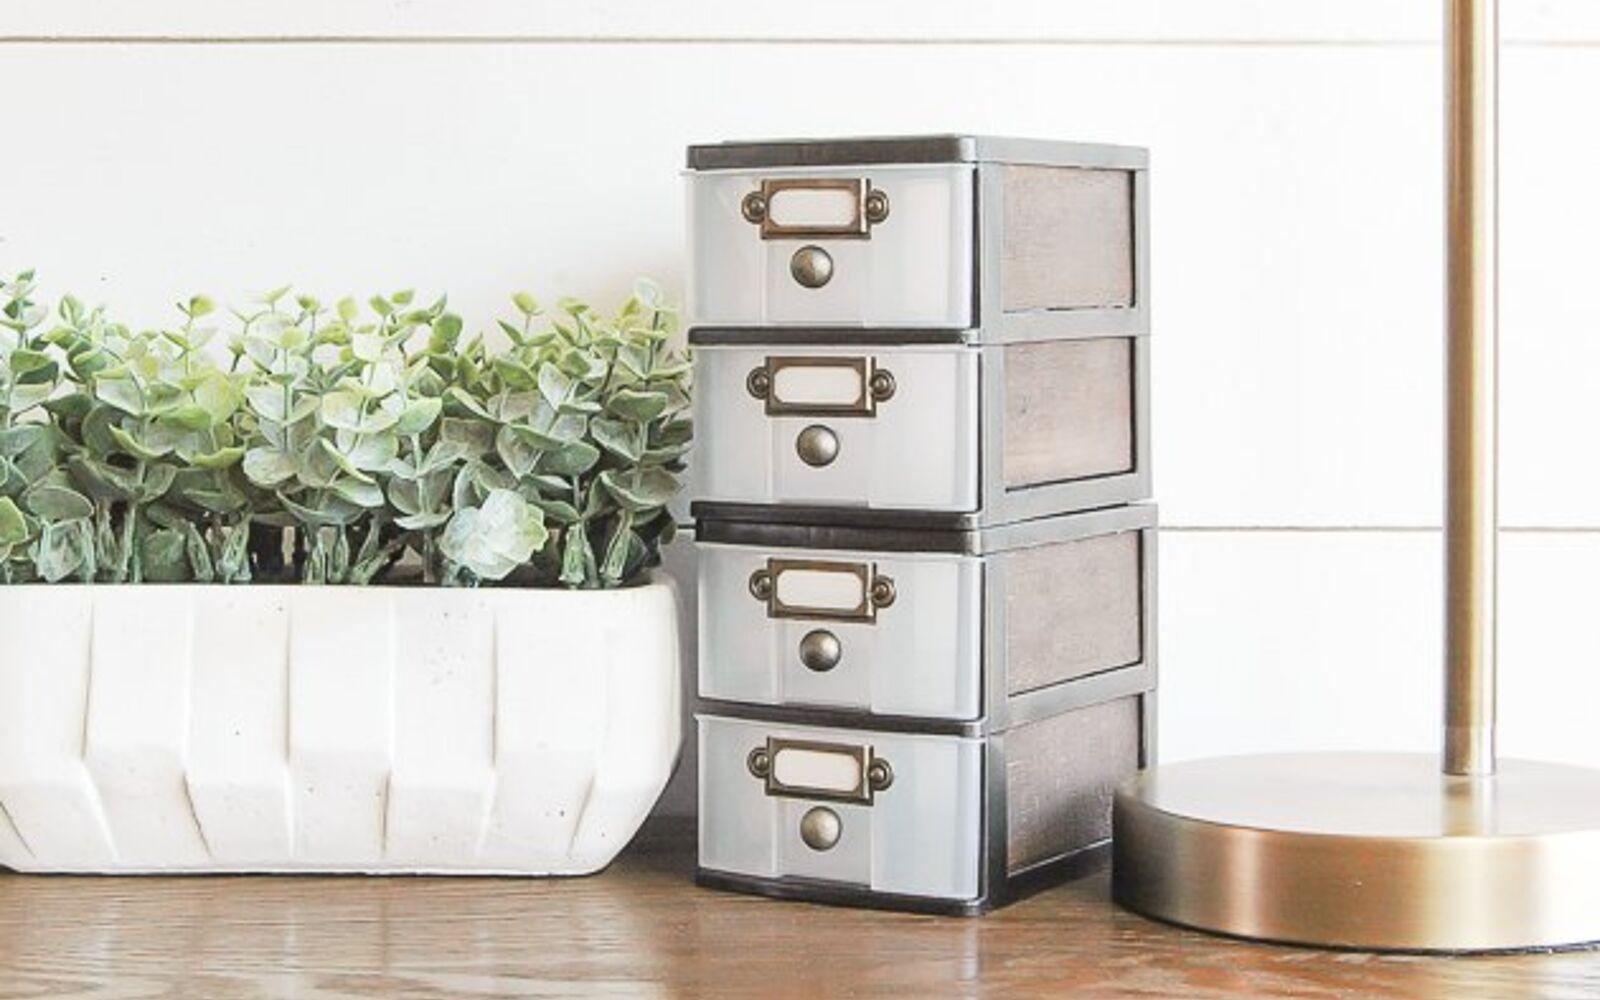 s 32 space saving storage ideas that ll keep your home organized, Turn plastic bins into farmhouse decor